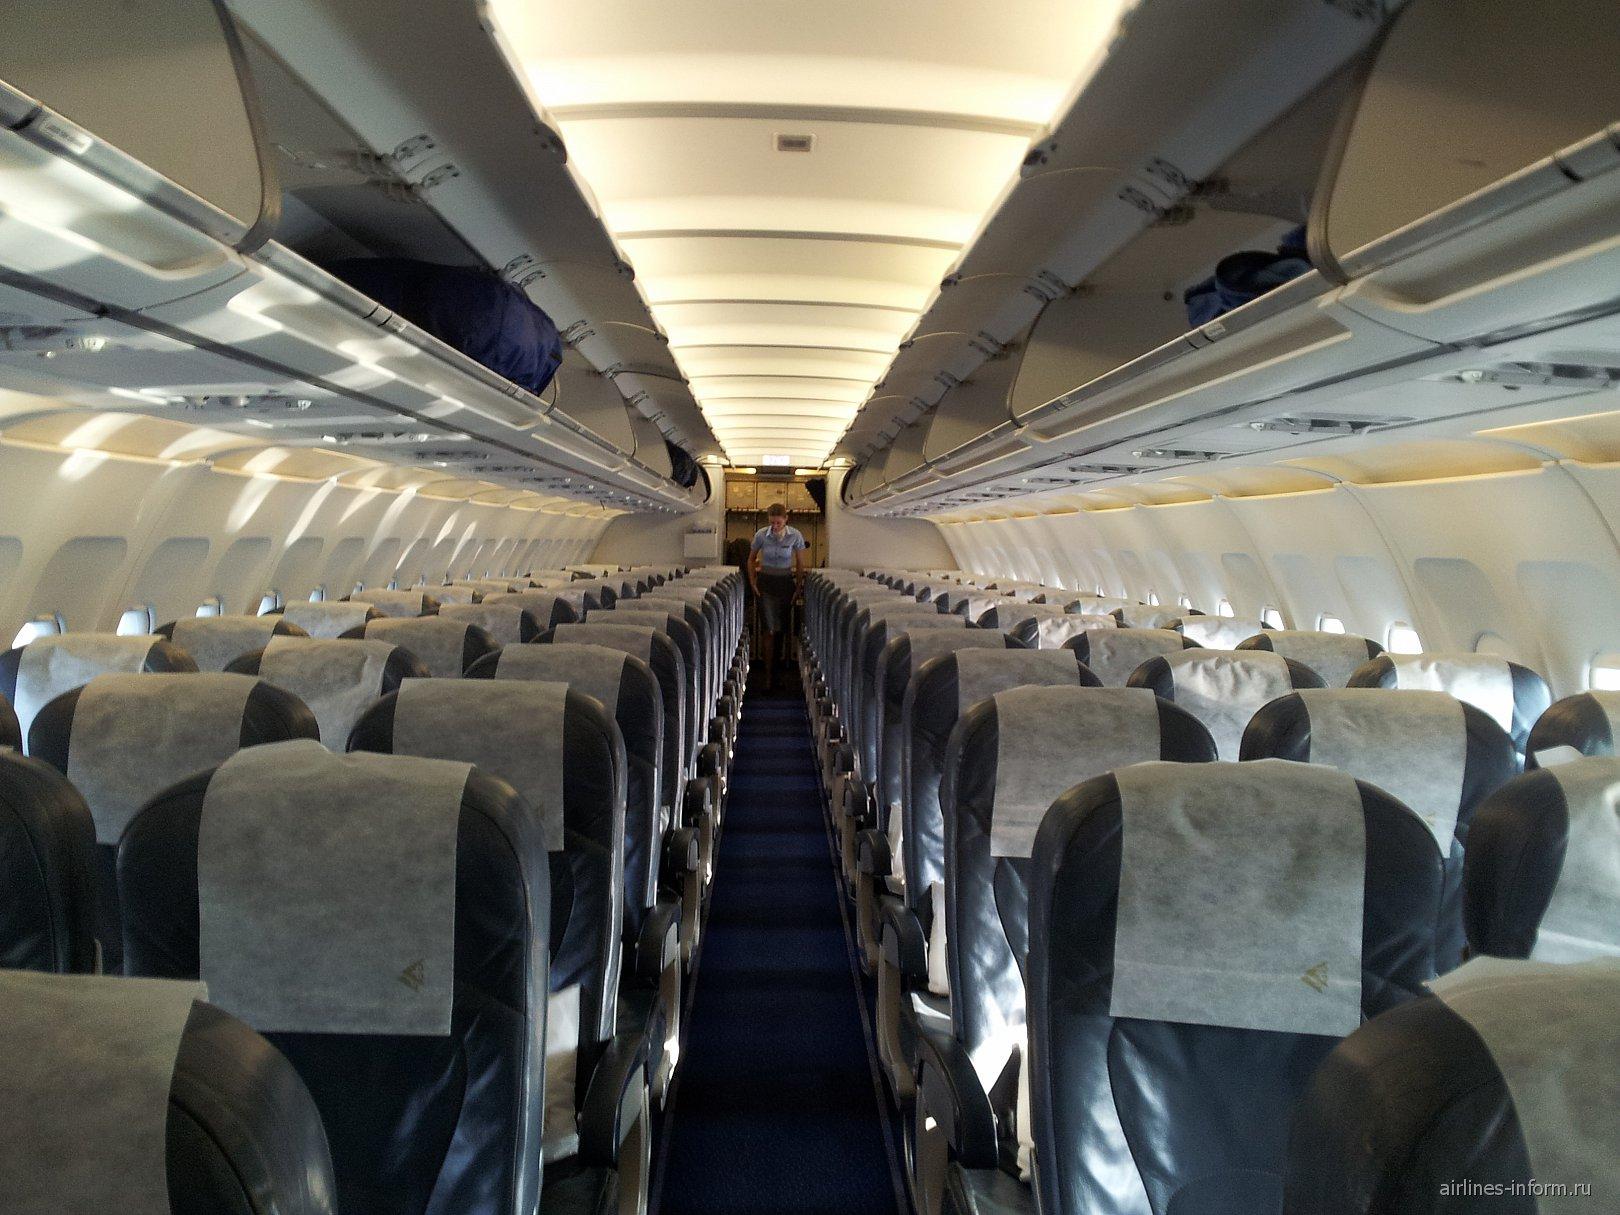 Салон самолета Airbus A320 P4-TAS авиакомпании Air Astana